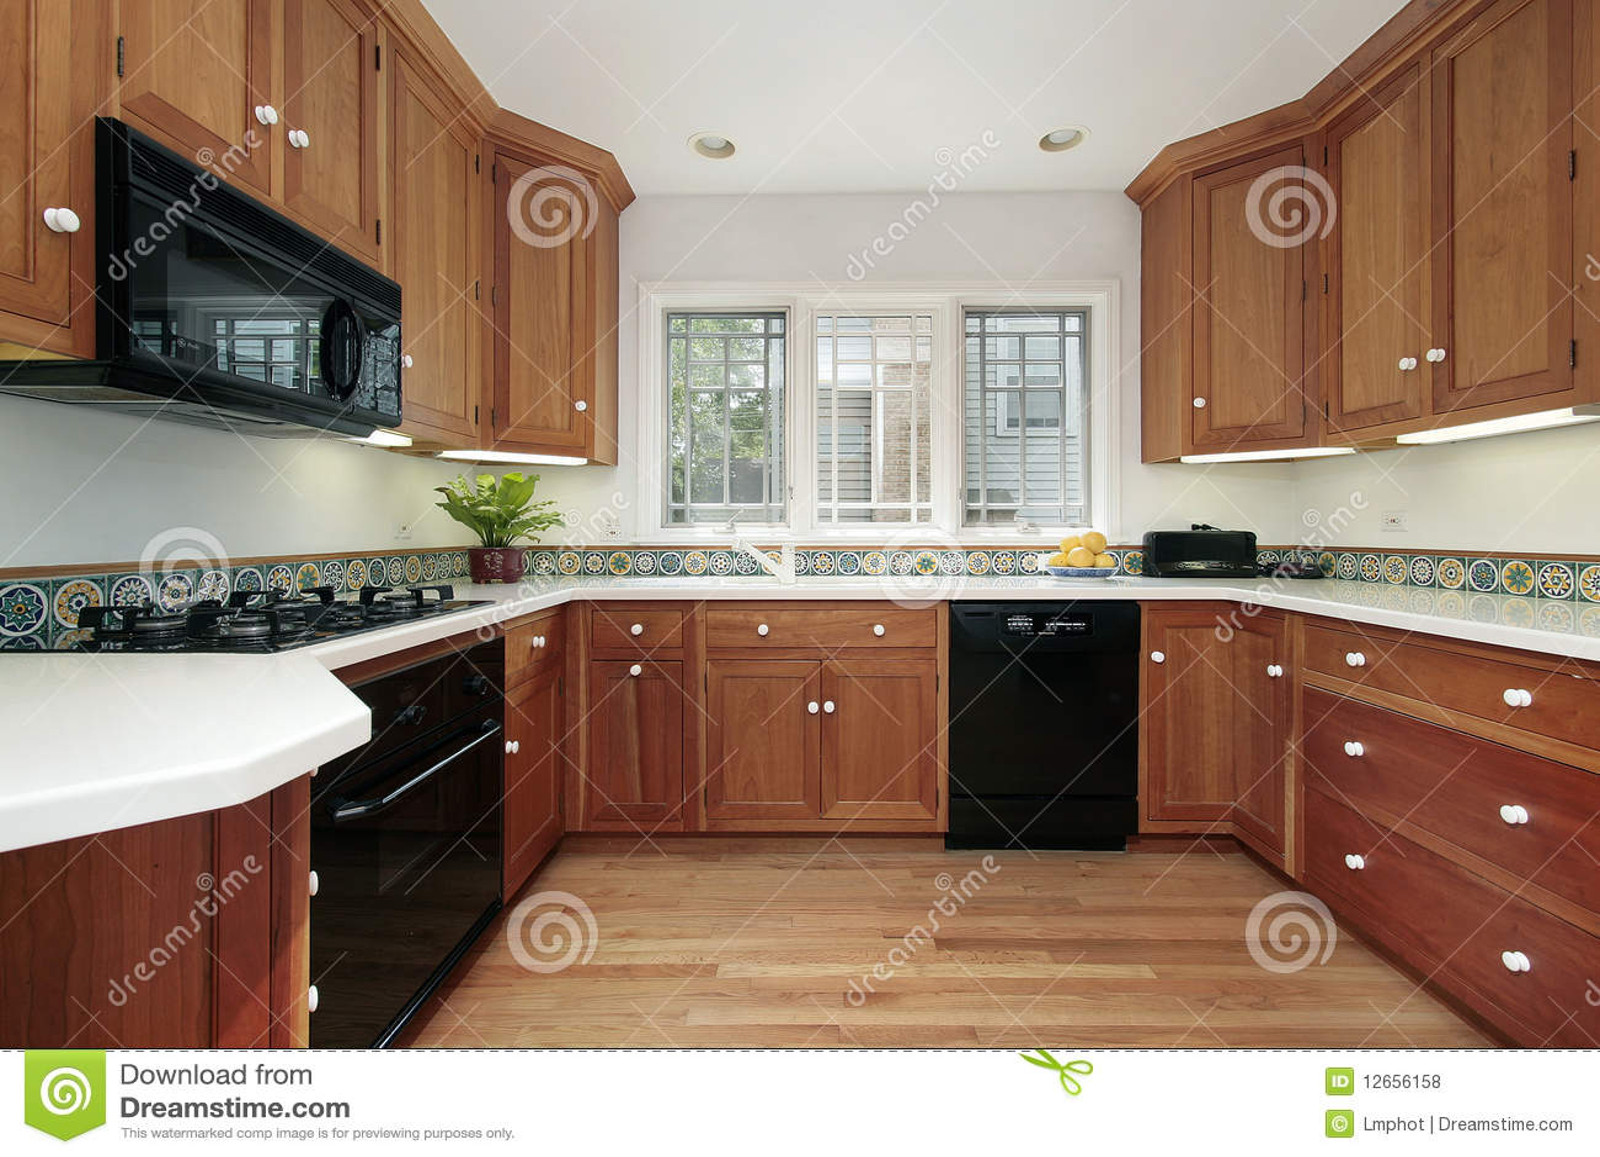 kitchen in suburban home royalty free stock photos image 12656158